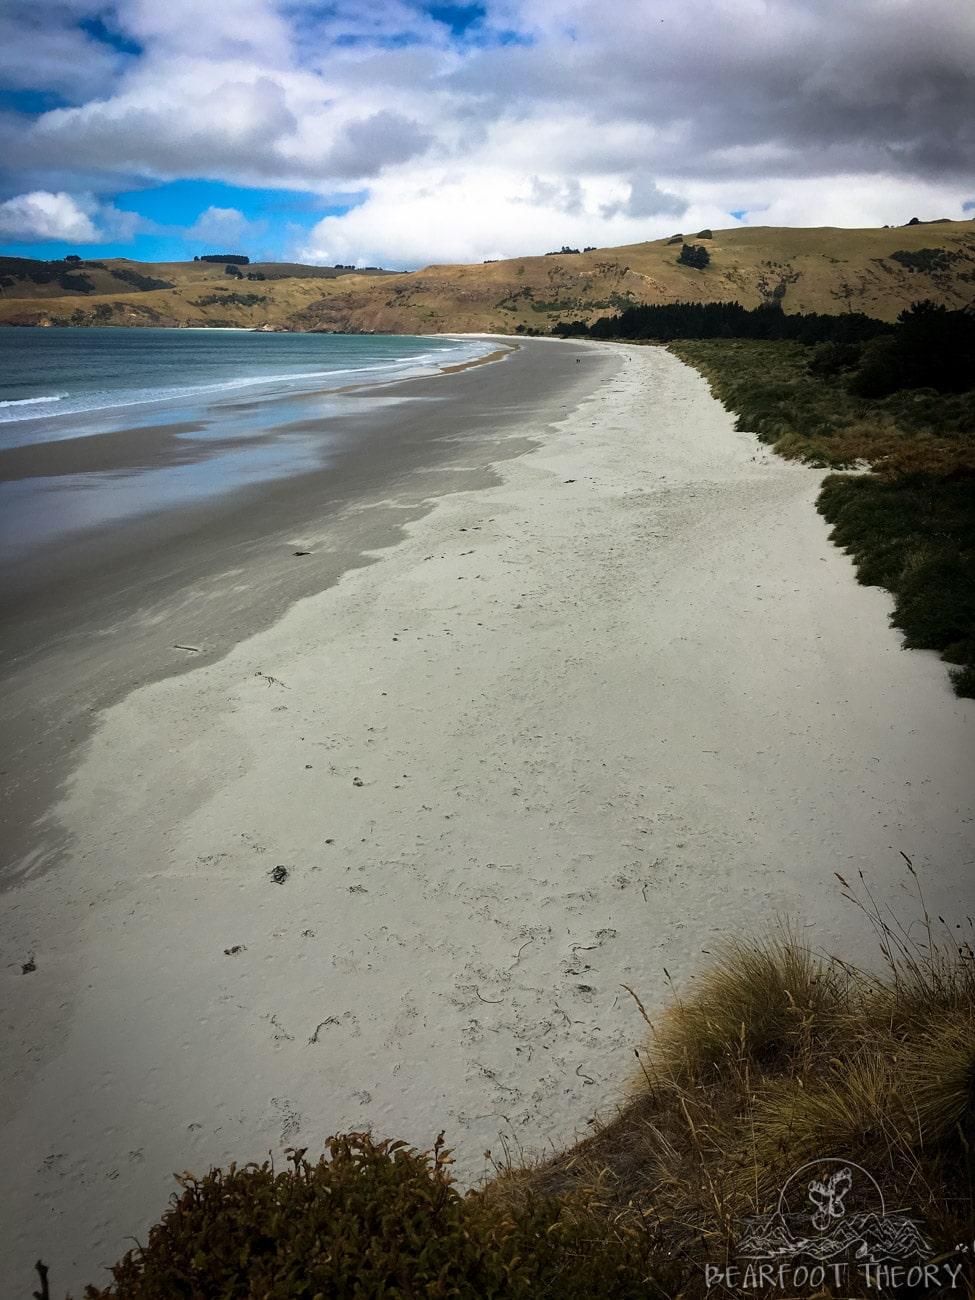 New Zealand road trip: Climbing at Long Beach in Dunedin